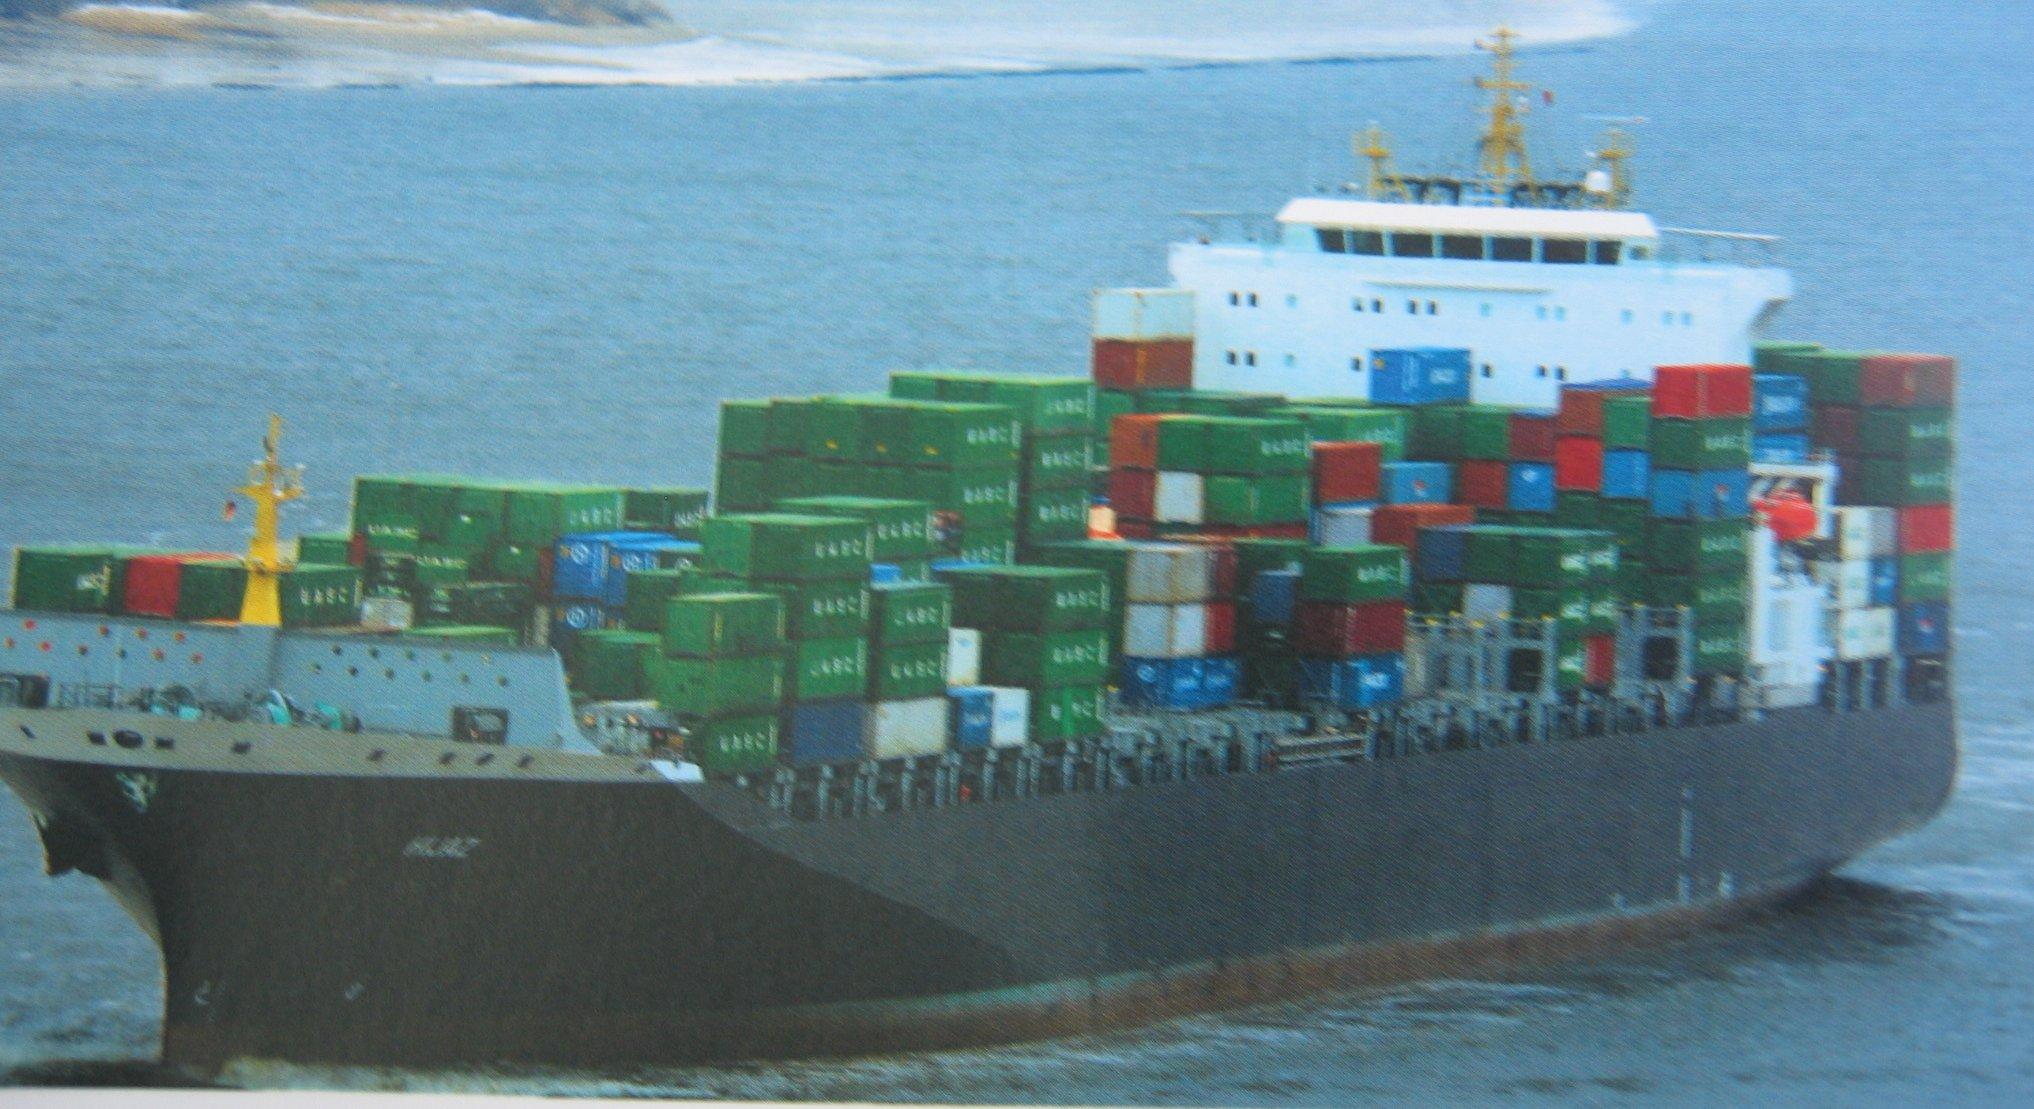 69101_Container_4546_TEU_122_459lo.JPG